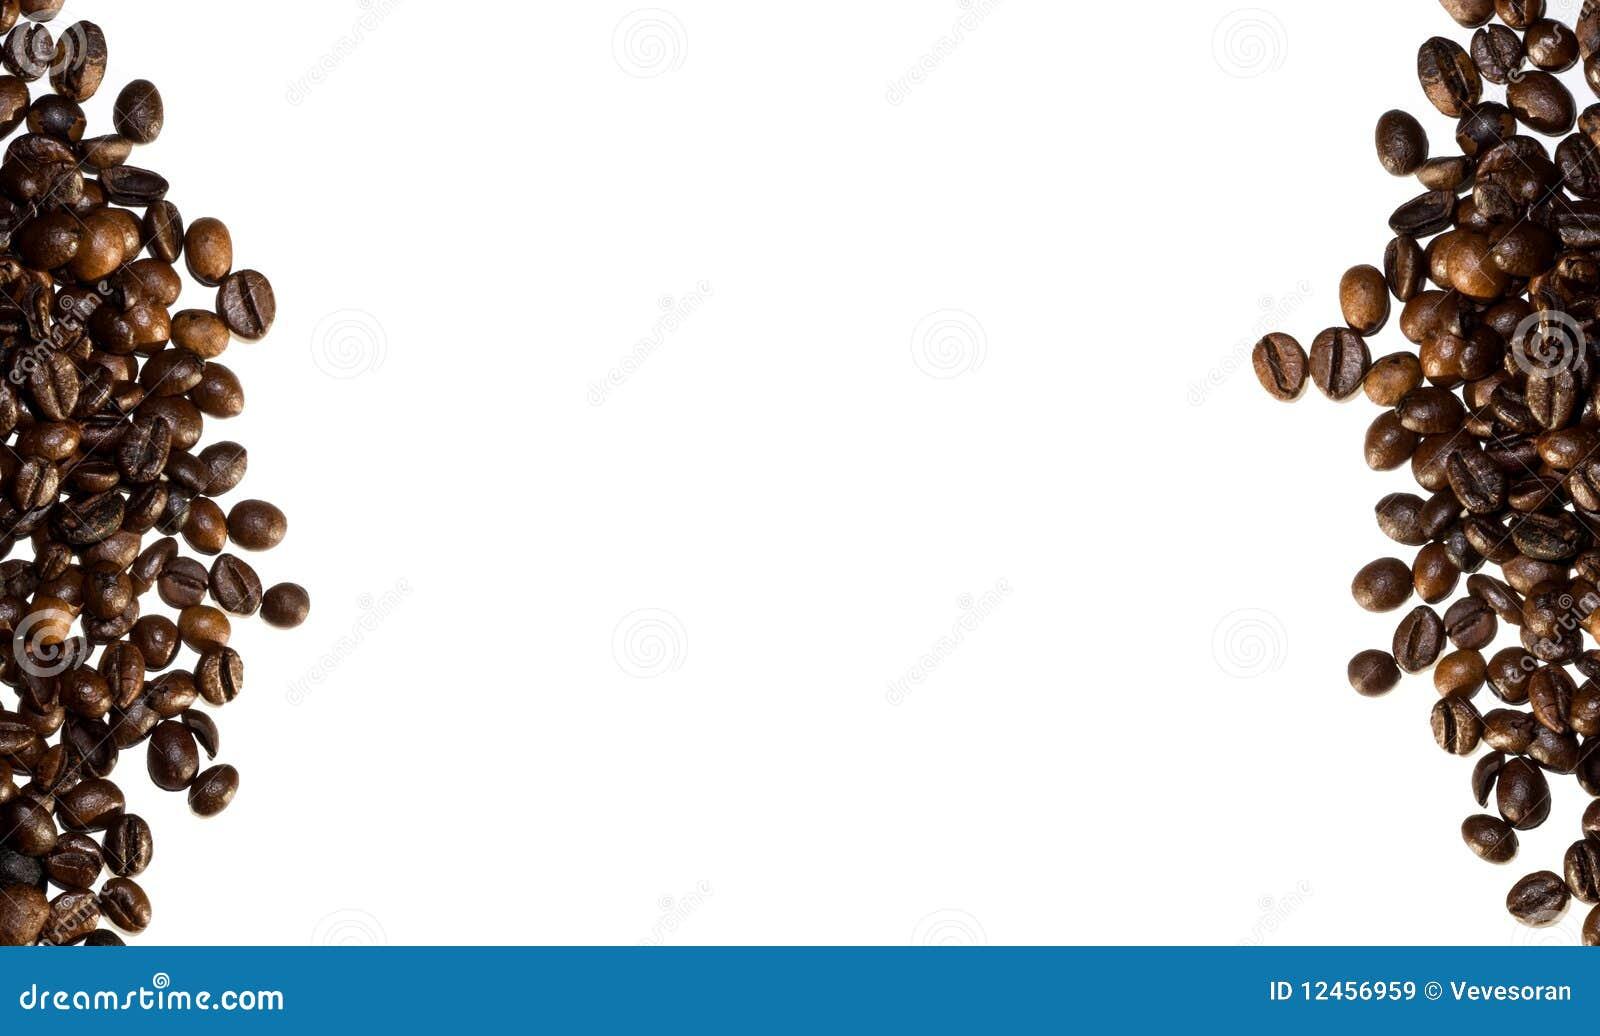 Coffee beans border stock image. Image of bean, edge - 26403735